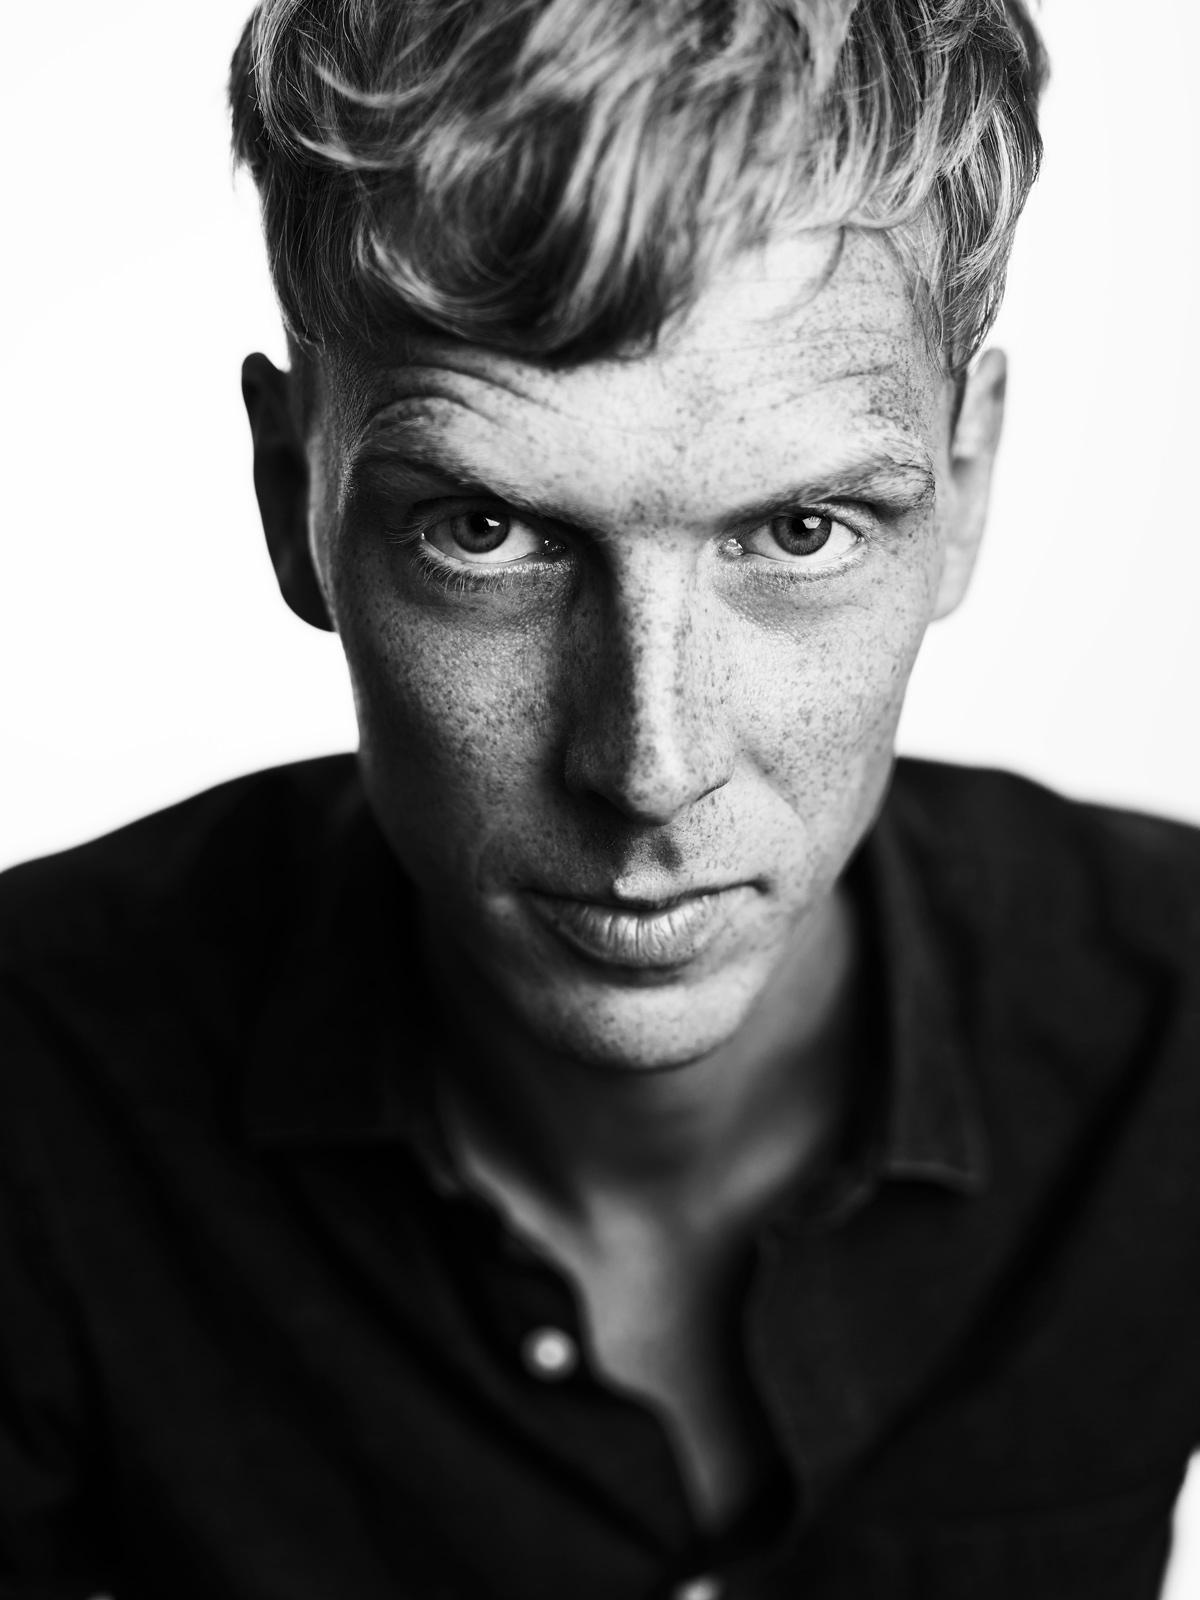 Photo by:Julian Erksmeyer